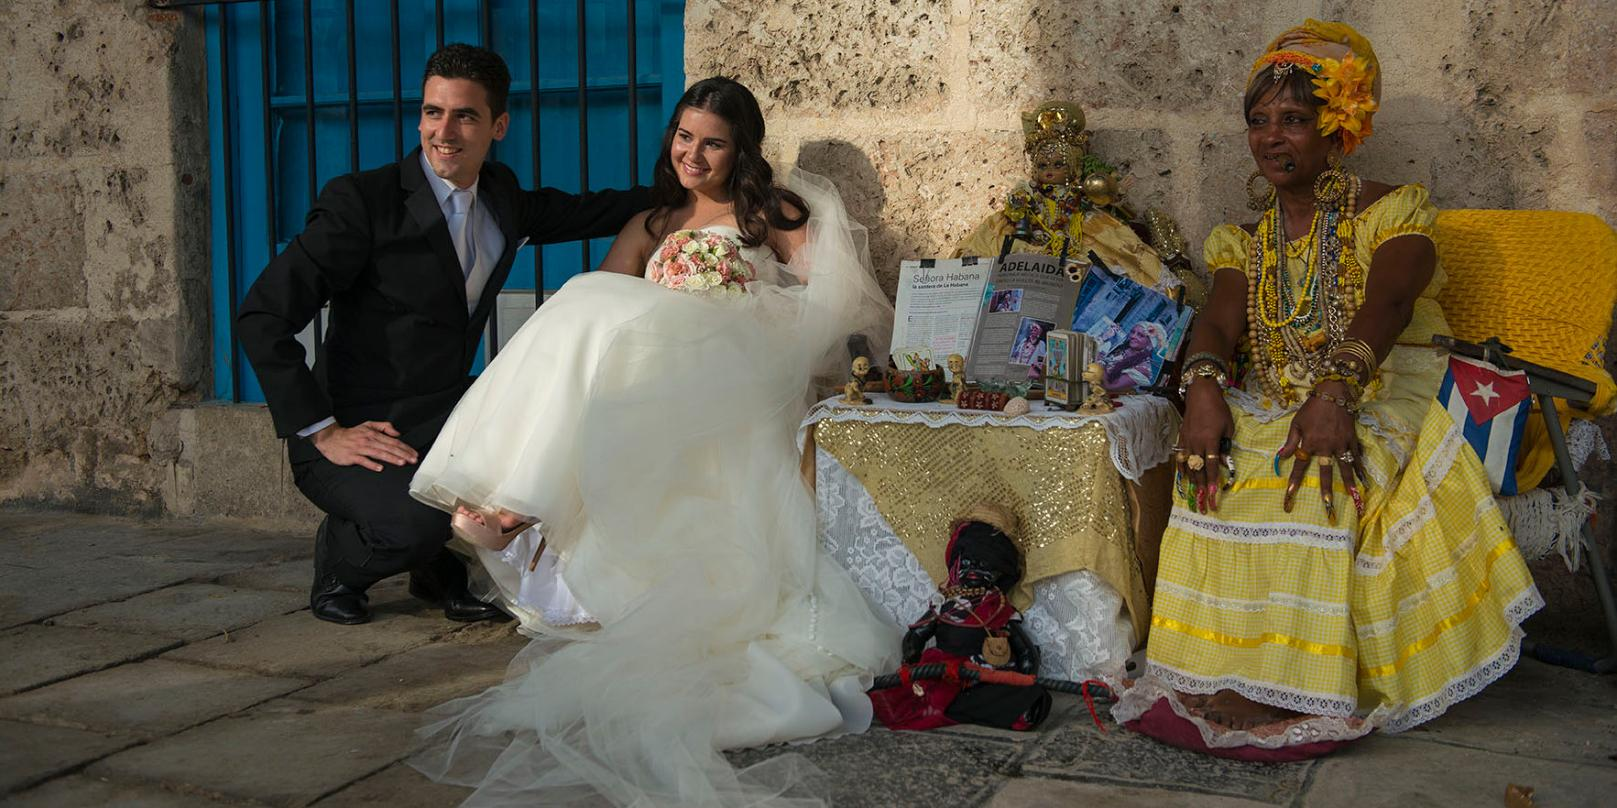 bodas-sin-clasificar-sin-tema-cuba-15521.jpg